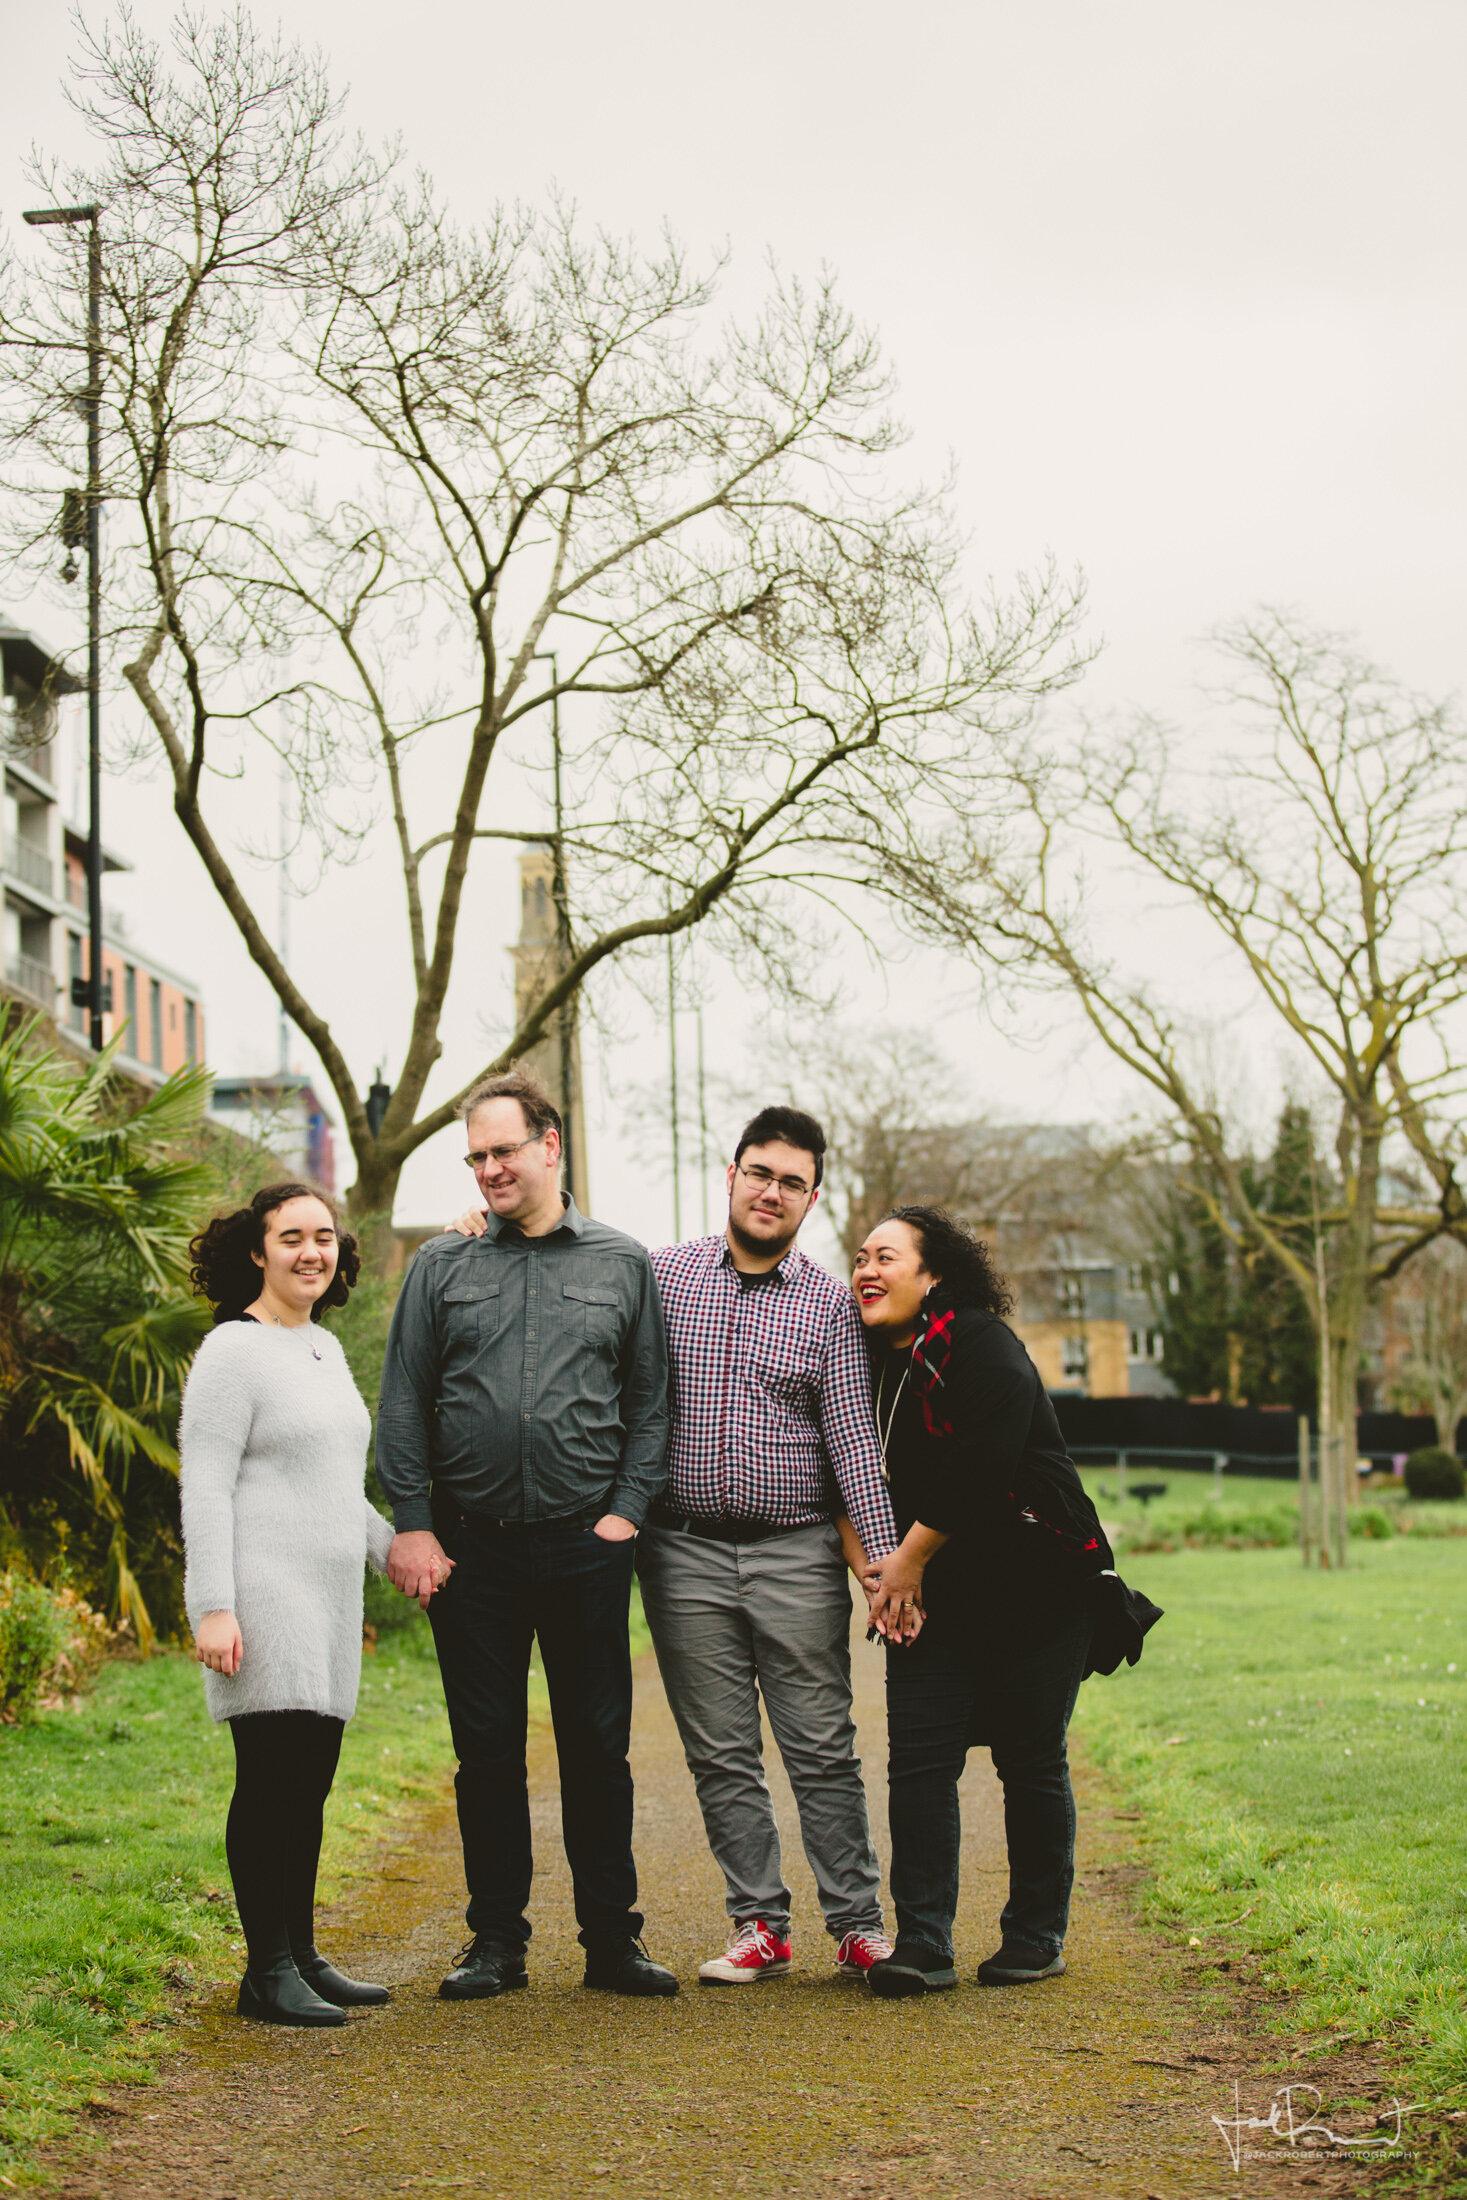 Family Session - Cole Family - London, United Kingdom - Jack Robert Photography